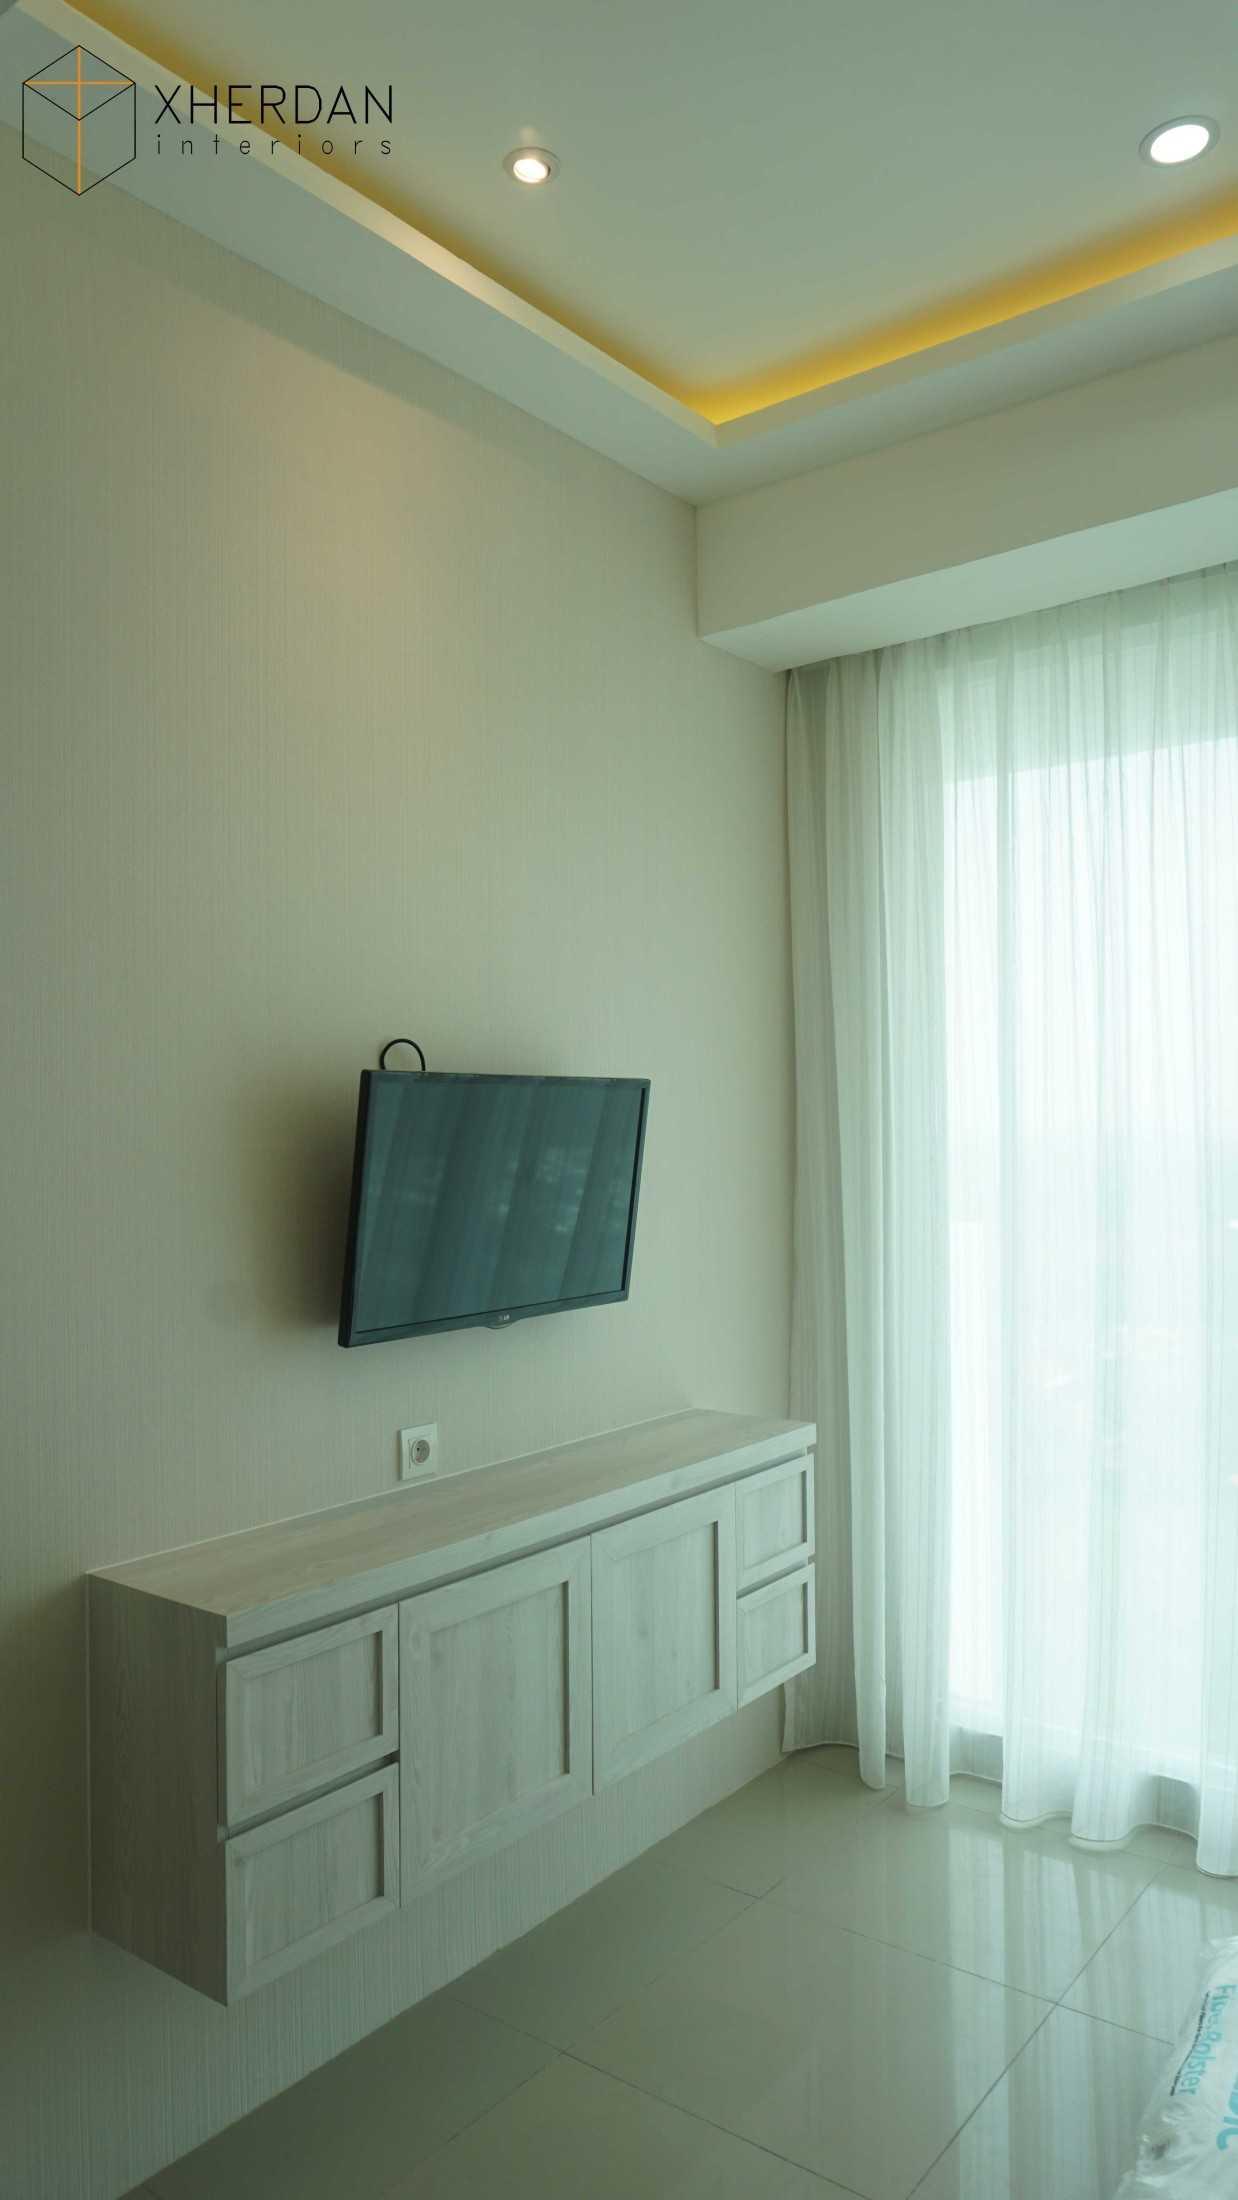 Xherdan Interiors Tree Park Apartment Lengkong Gudang, Serpong, Kota Tangerang Selatan, Banten 15321, Indonesia Lengkong Gudang, Serpong, Kota Tangerang Selatan, Banten 15321, Indonesia Xherdan-Interiors-Tree-Park-Apartment  70567